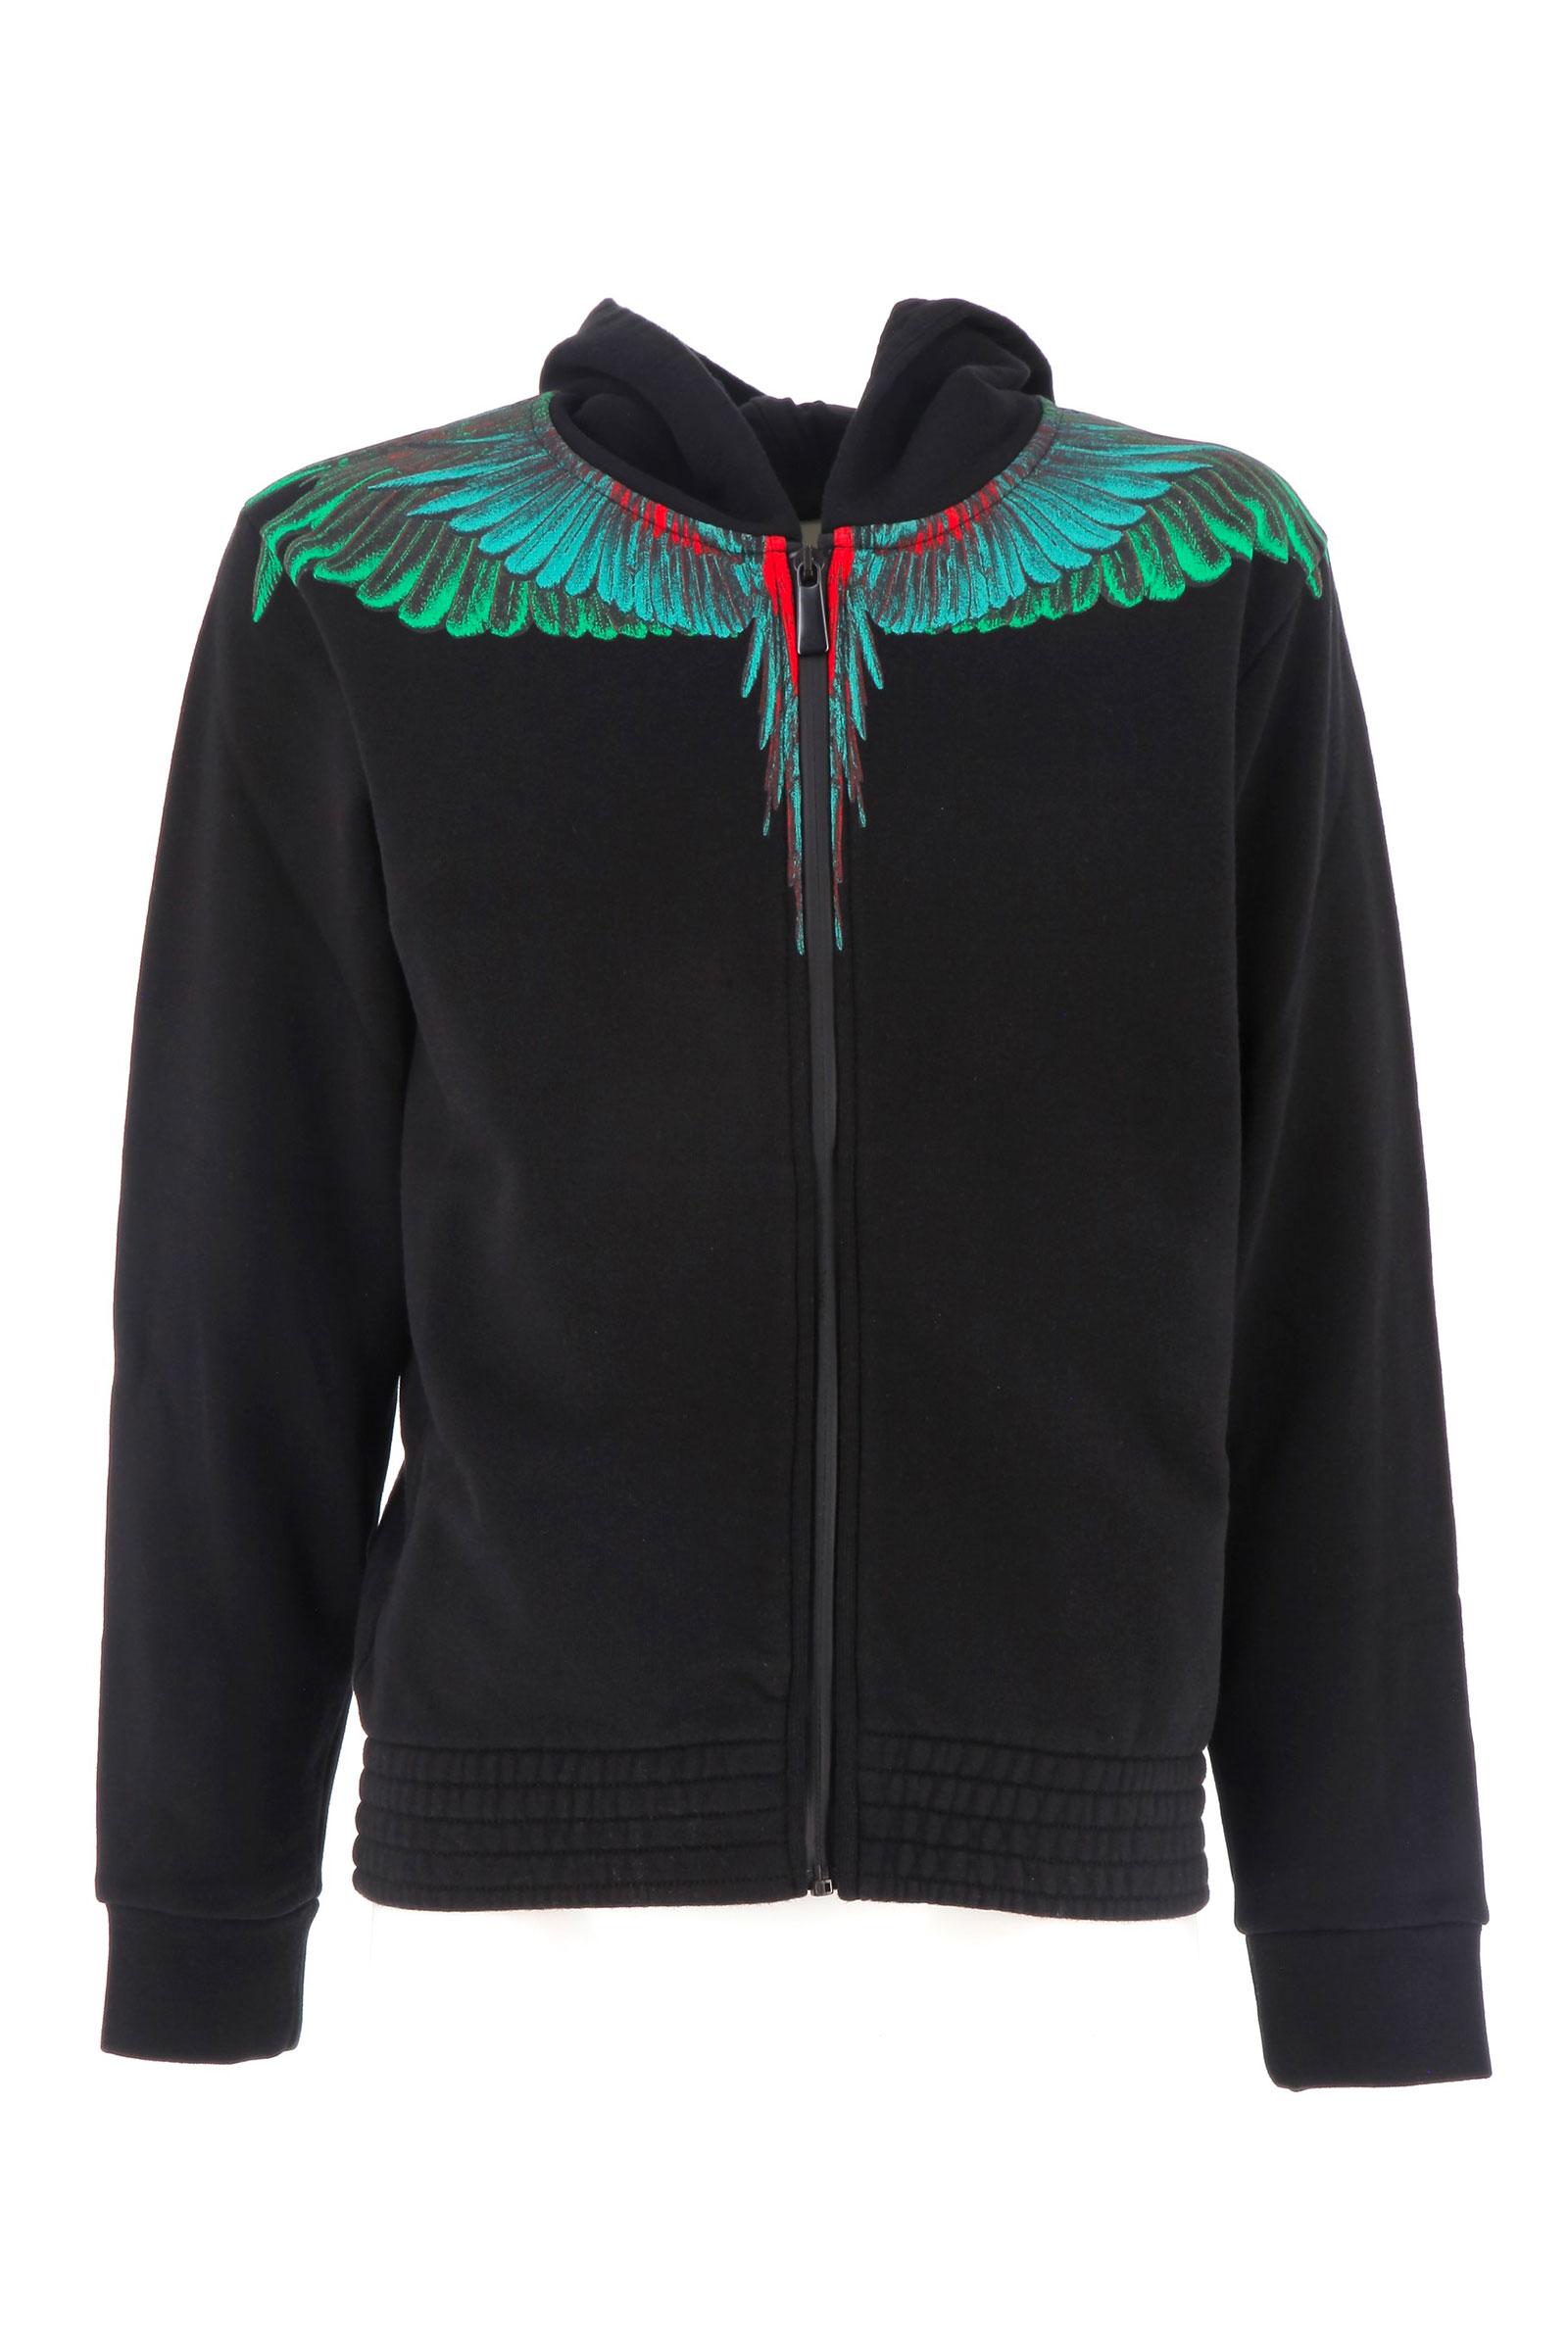 Fall/winter sweatshirt MARCELO BURLON KIDS OF MILAN | Sweatshirt | BMB22040020B010